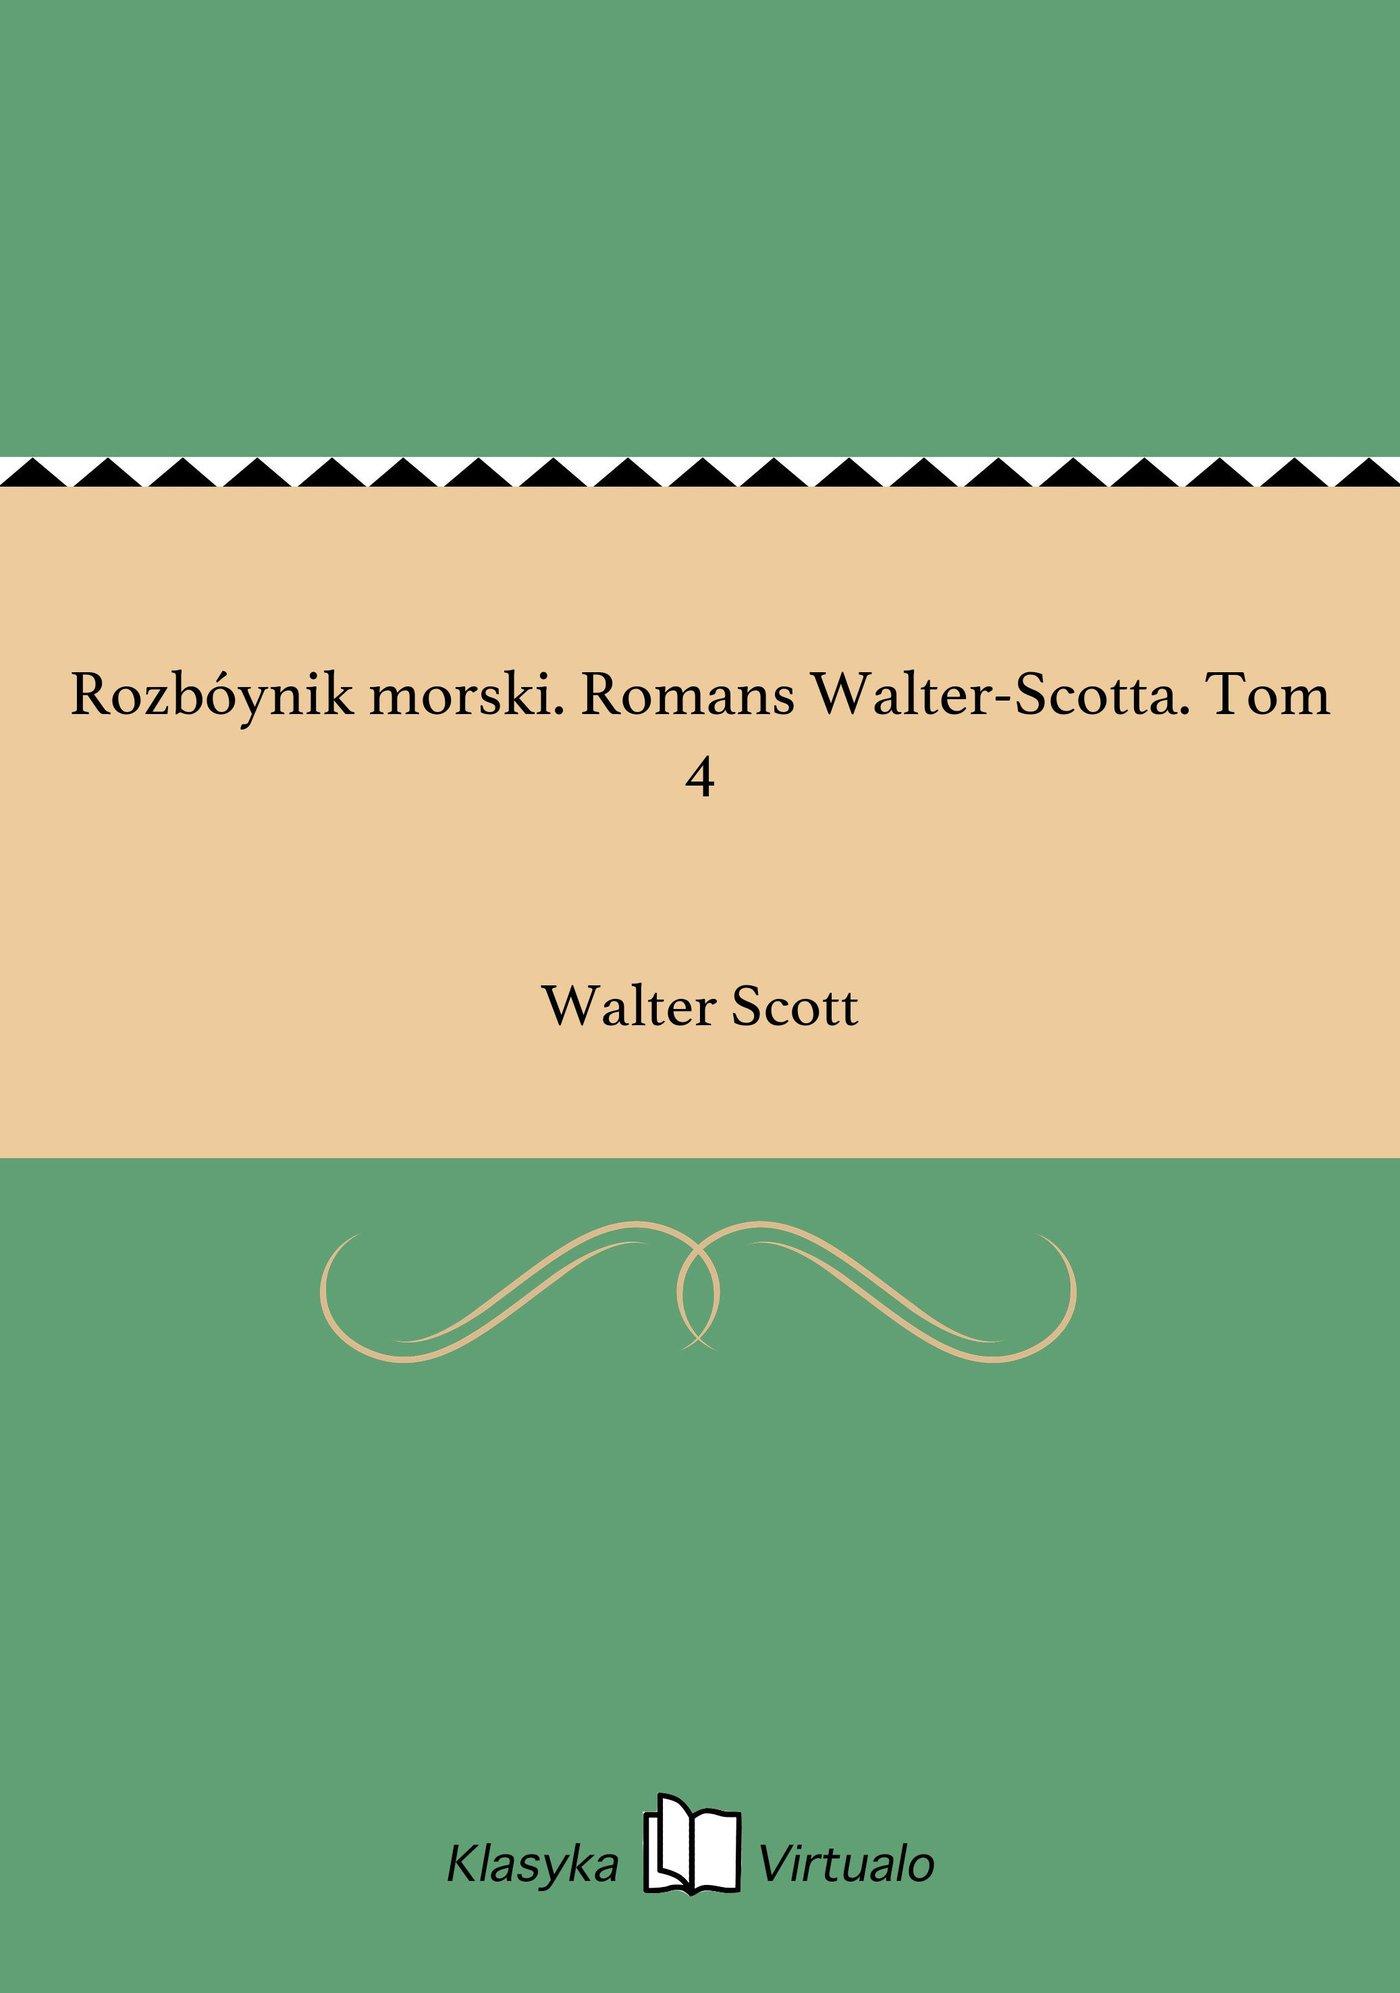 Rozbóynik morski. Romans Walter-Scotta. Tom 4 - Ebook (Książka EPUB) do pobrania w formacie EPUB